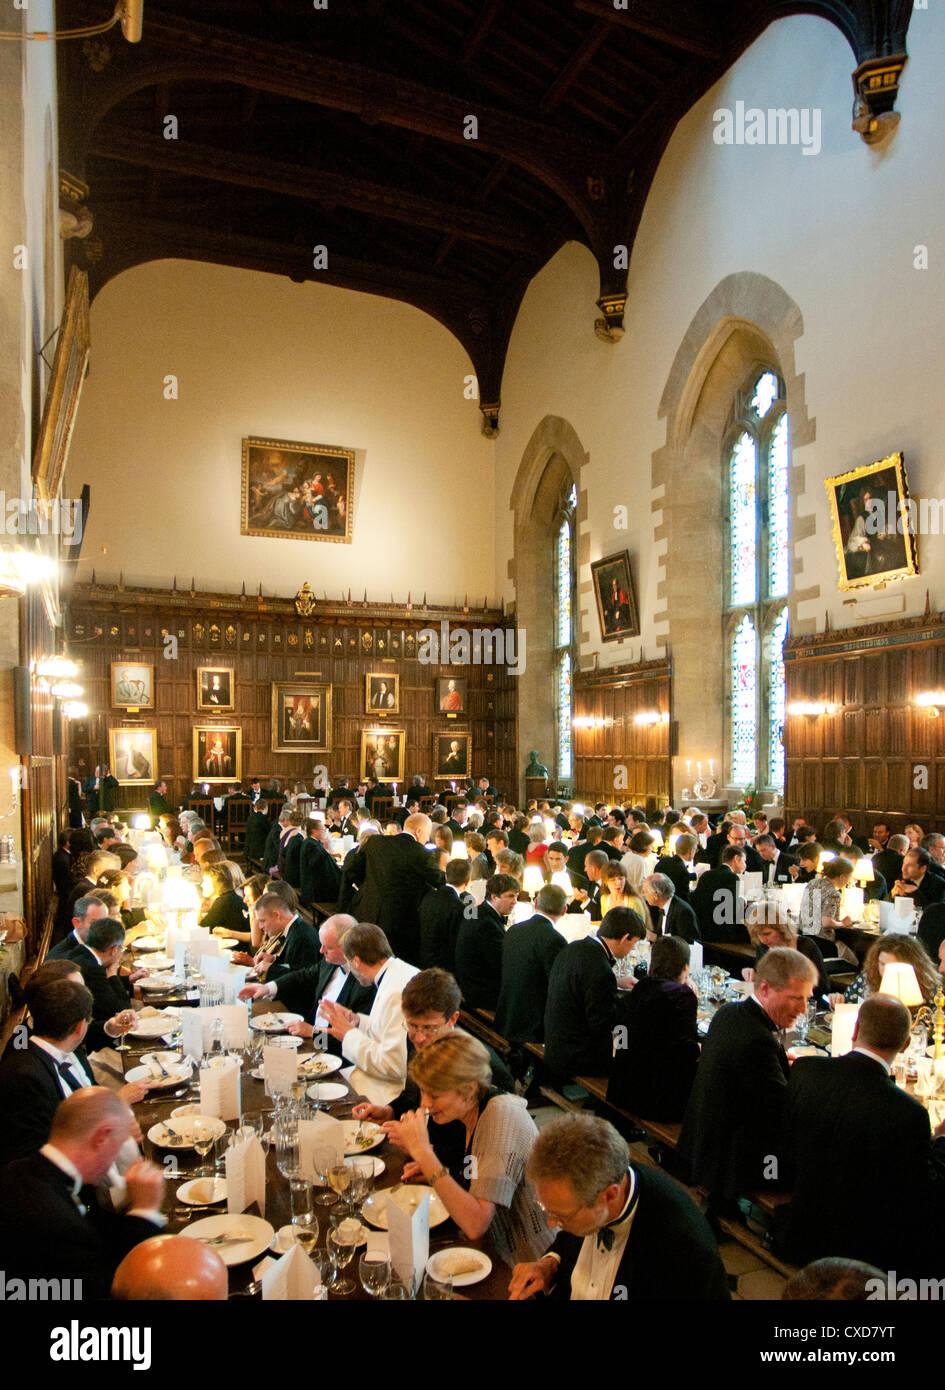 Oxbridge: Oxford college black tie dinner in New College, Oxford University, UK - Stock Image